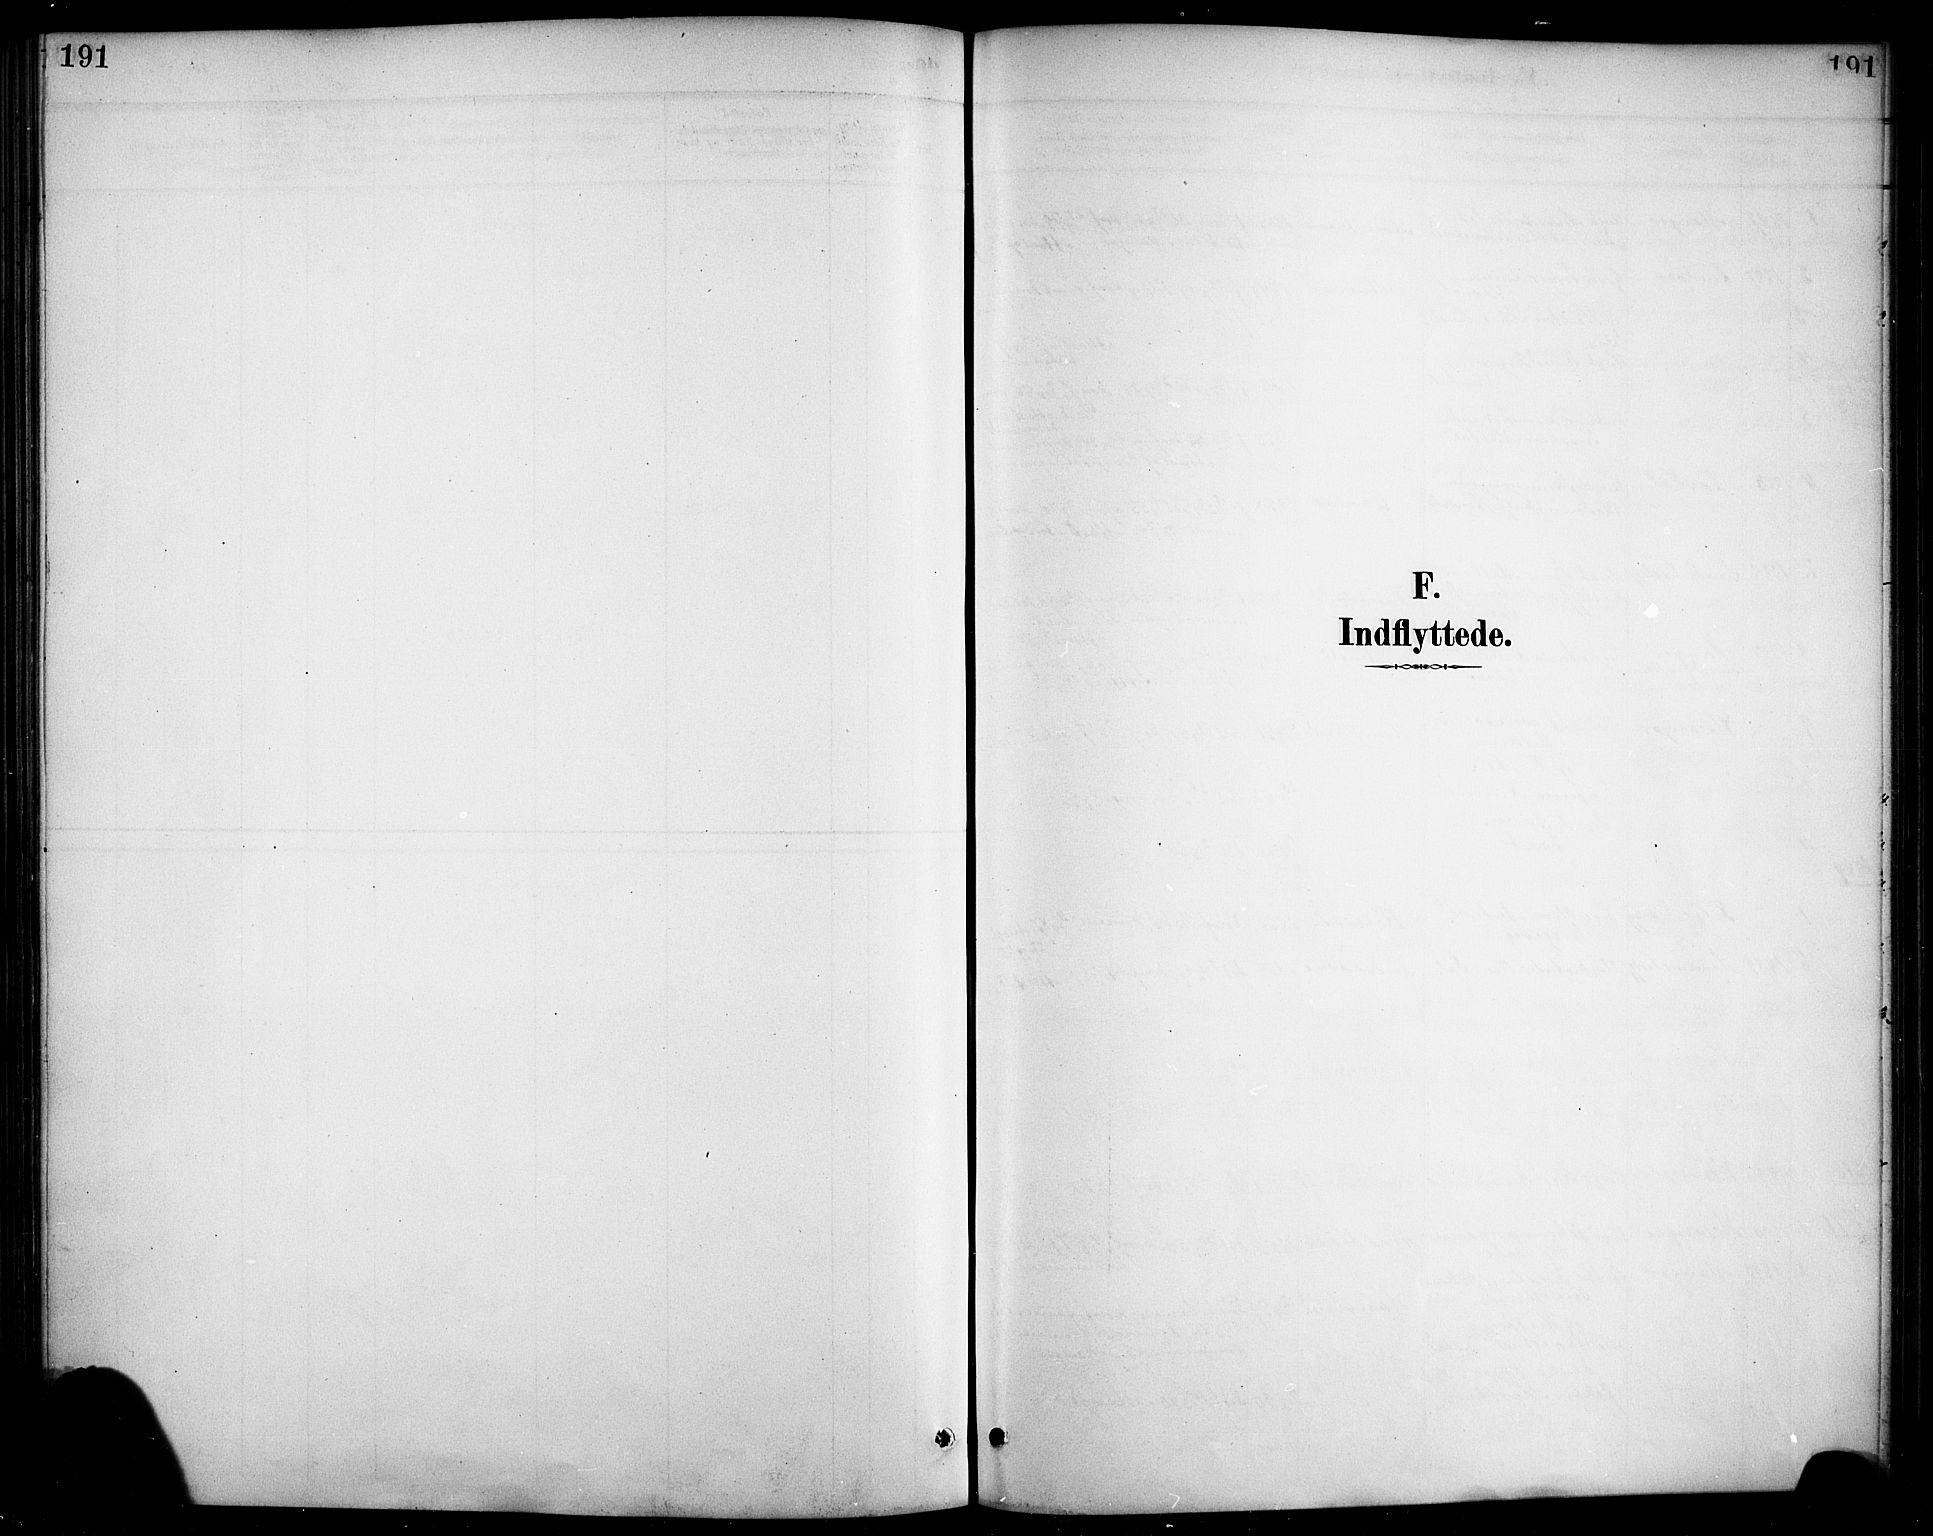 SAB, Haus sokneprestembete, H/Haa: Ministerialbok nr. D 1, 1887-1898, s. 191